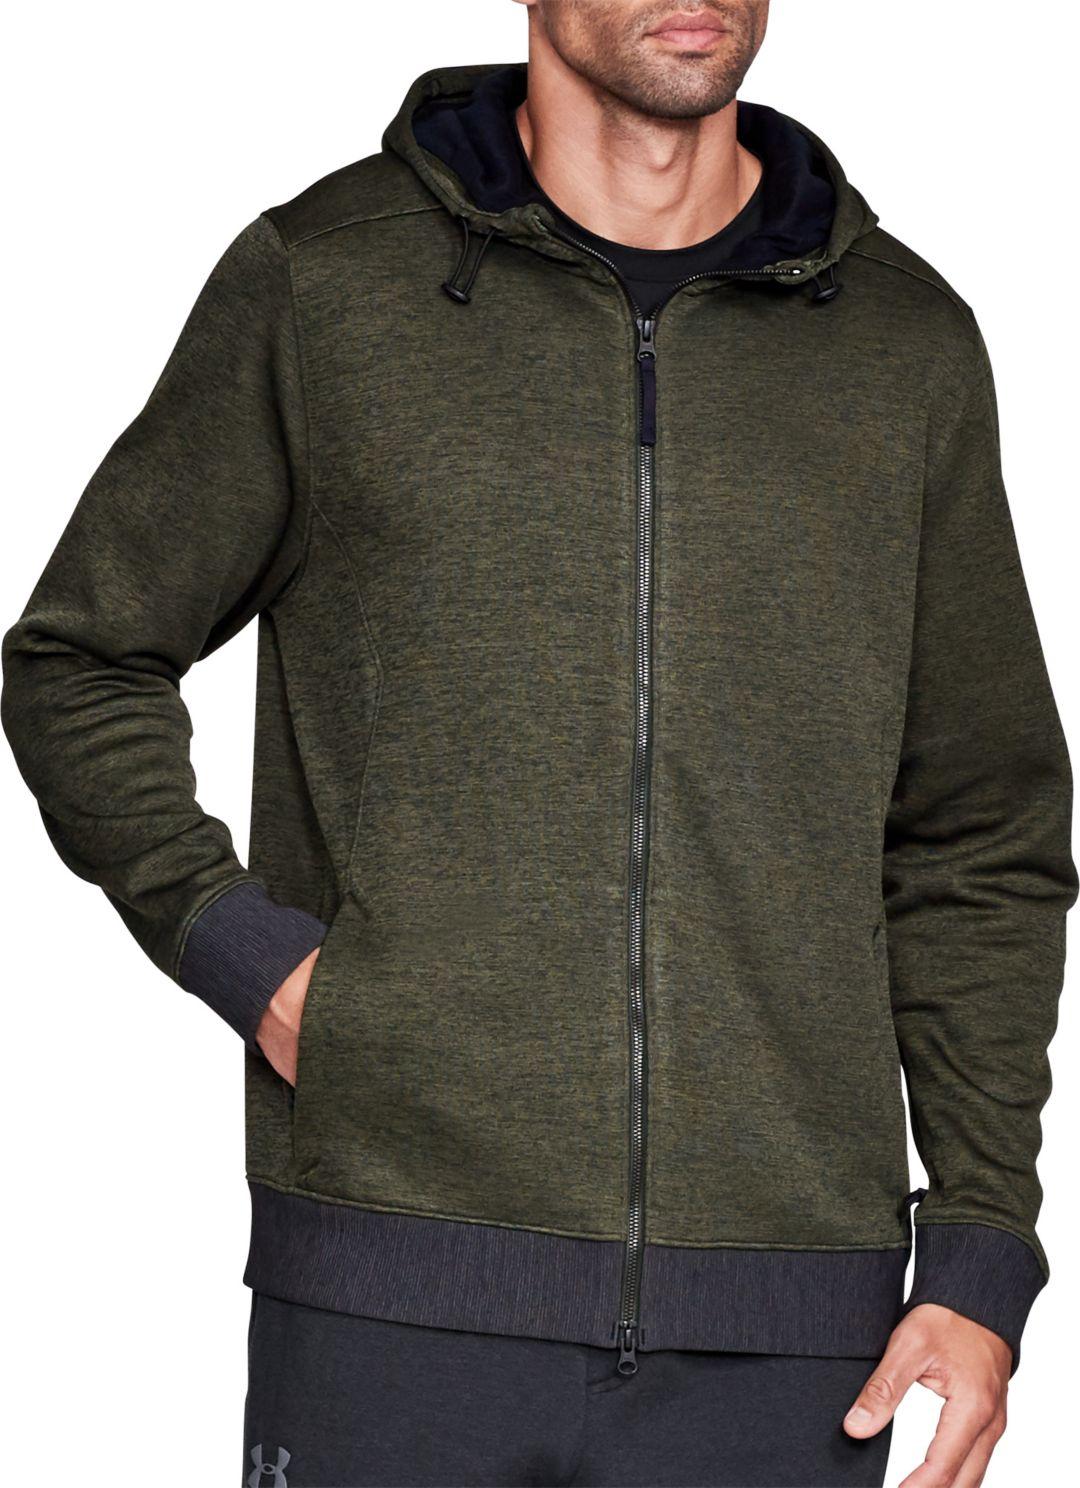 91f465530 Under Armour Men's Sportstyle Sweater Fleece Full-Zip Long Sleeve T-Shirt 1